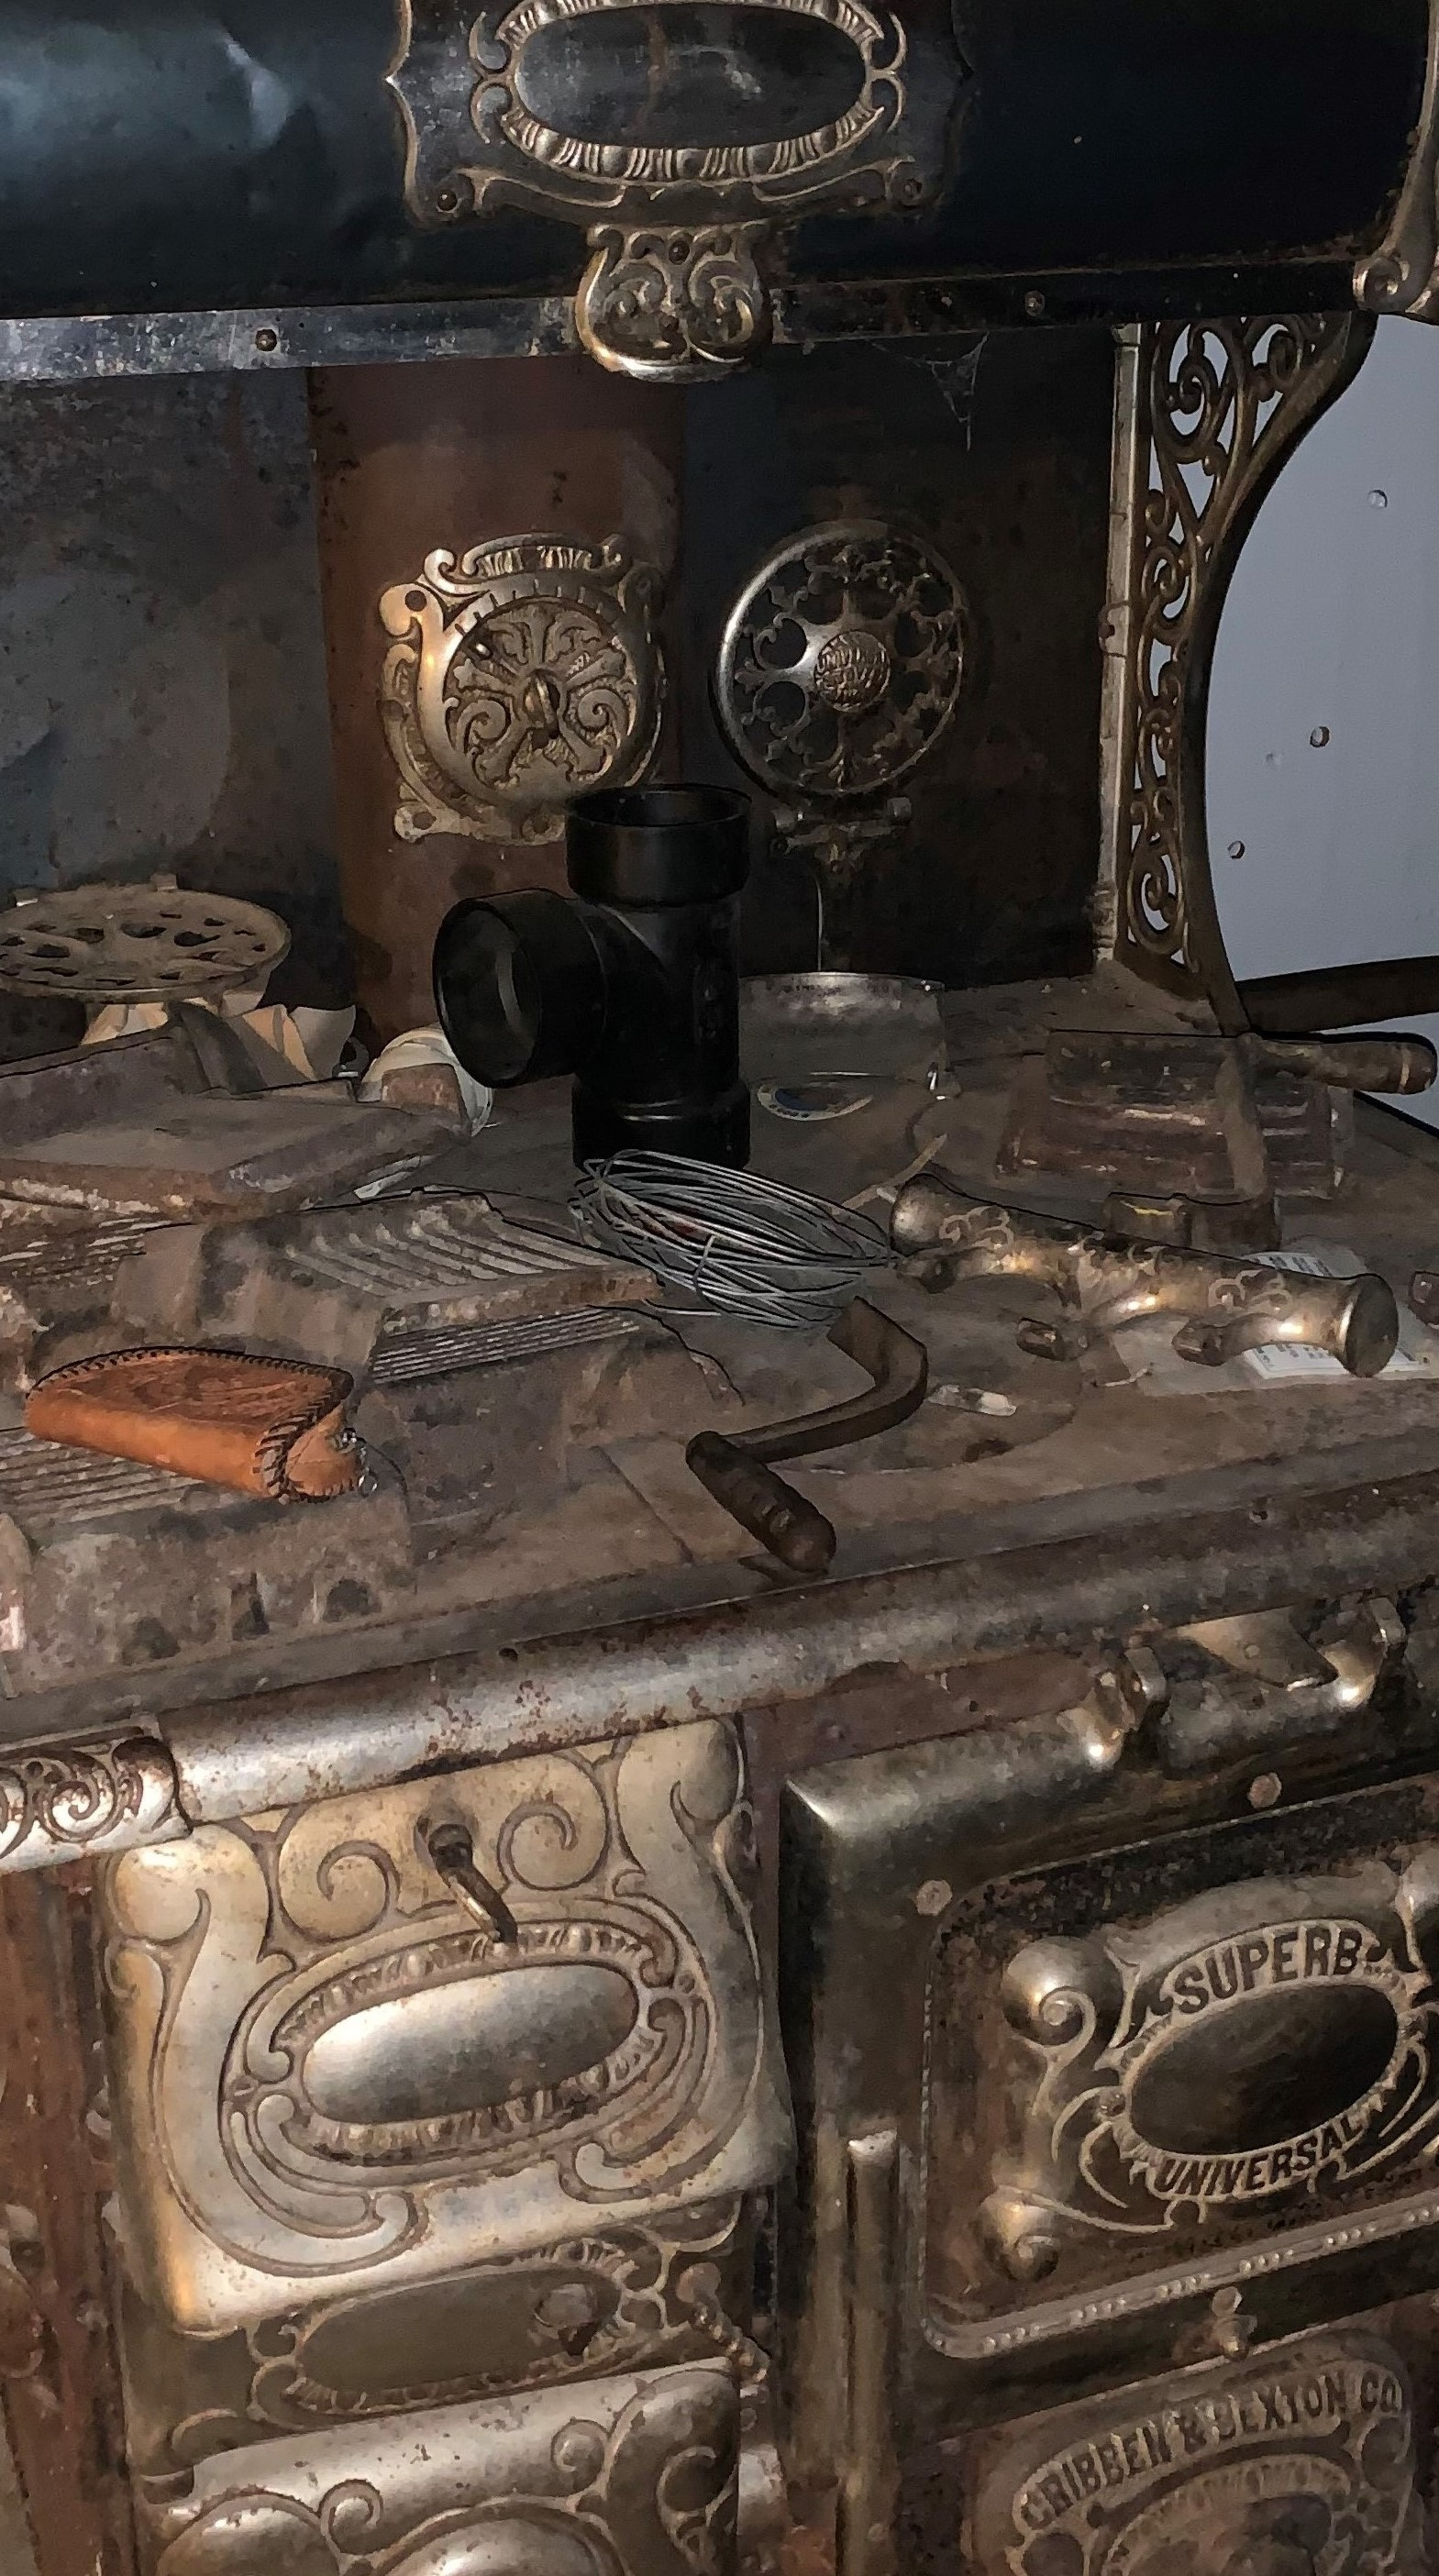 Antique Stove Antique Appraisal Instappraisal